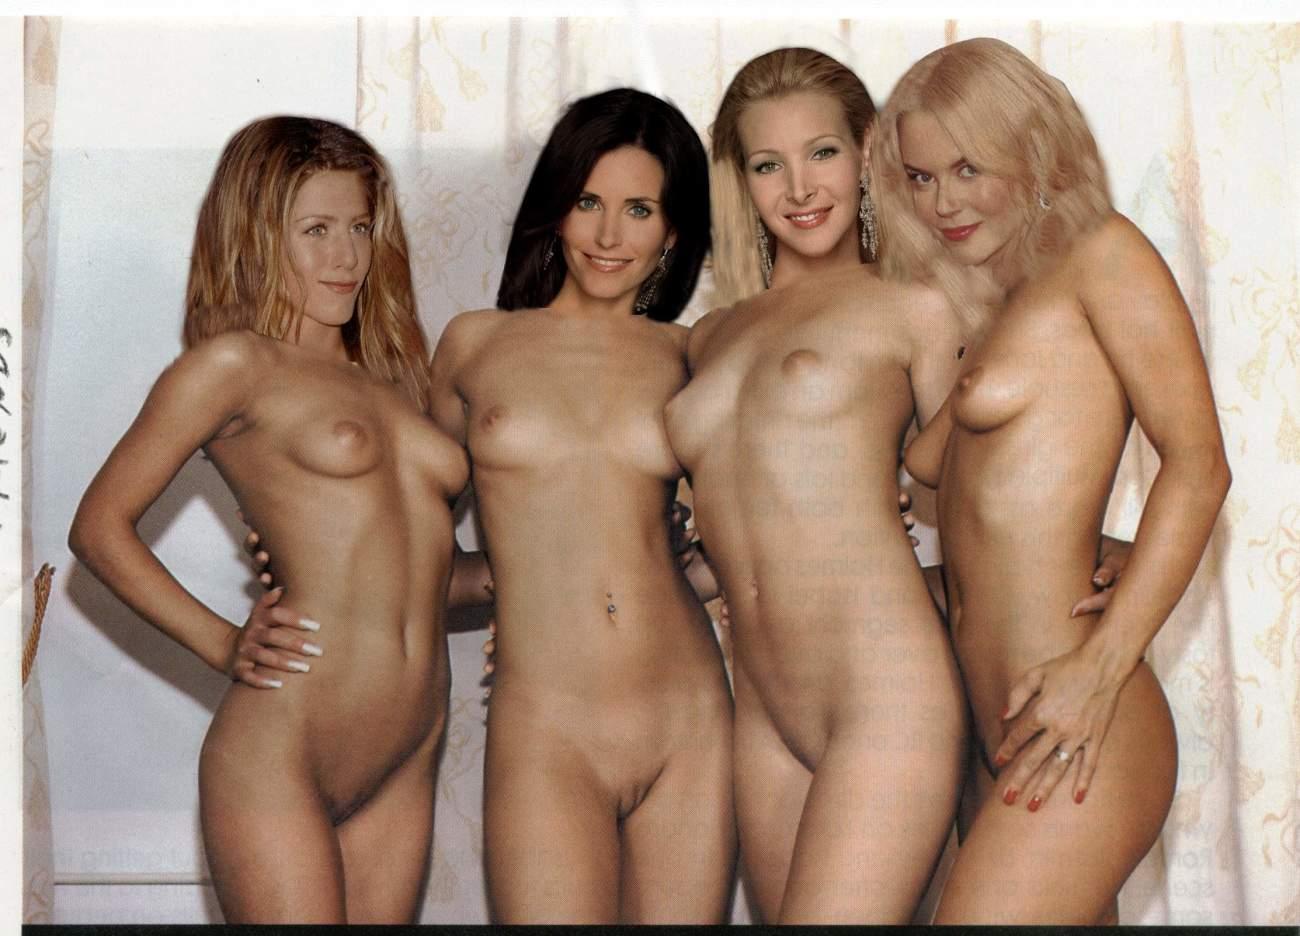 Latina spice girls nude